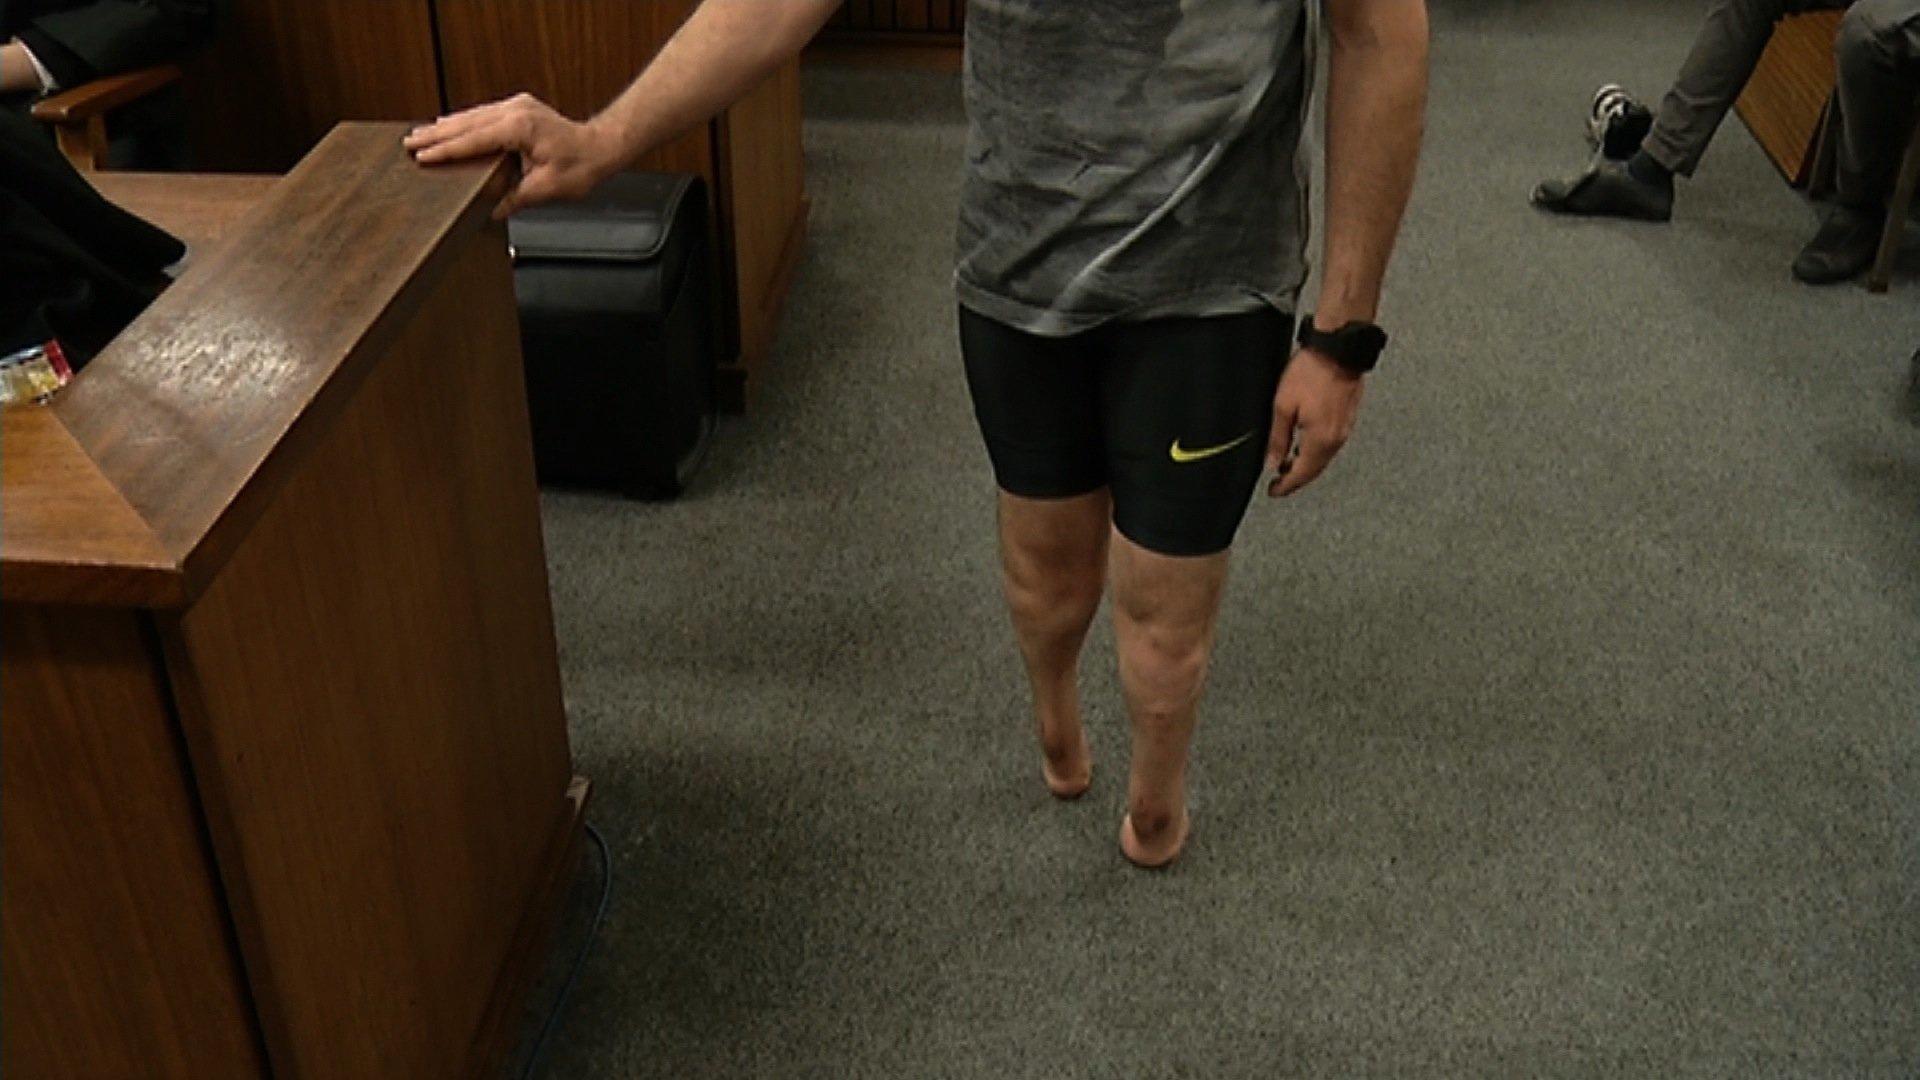 Oscar Pistorius: Gerrie Nel fails to convince judge over jailed Paralympian